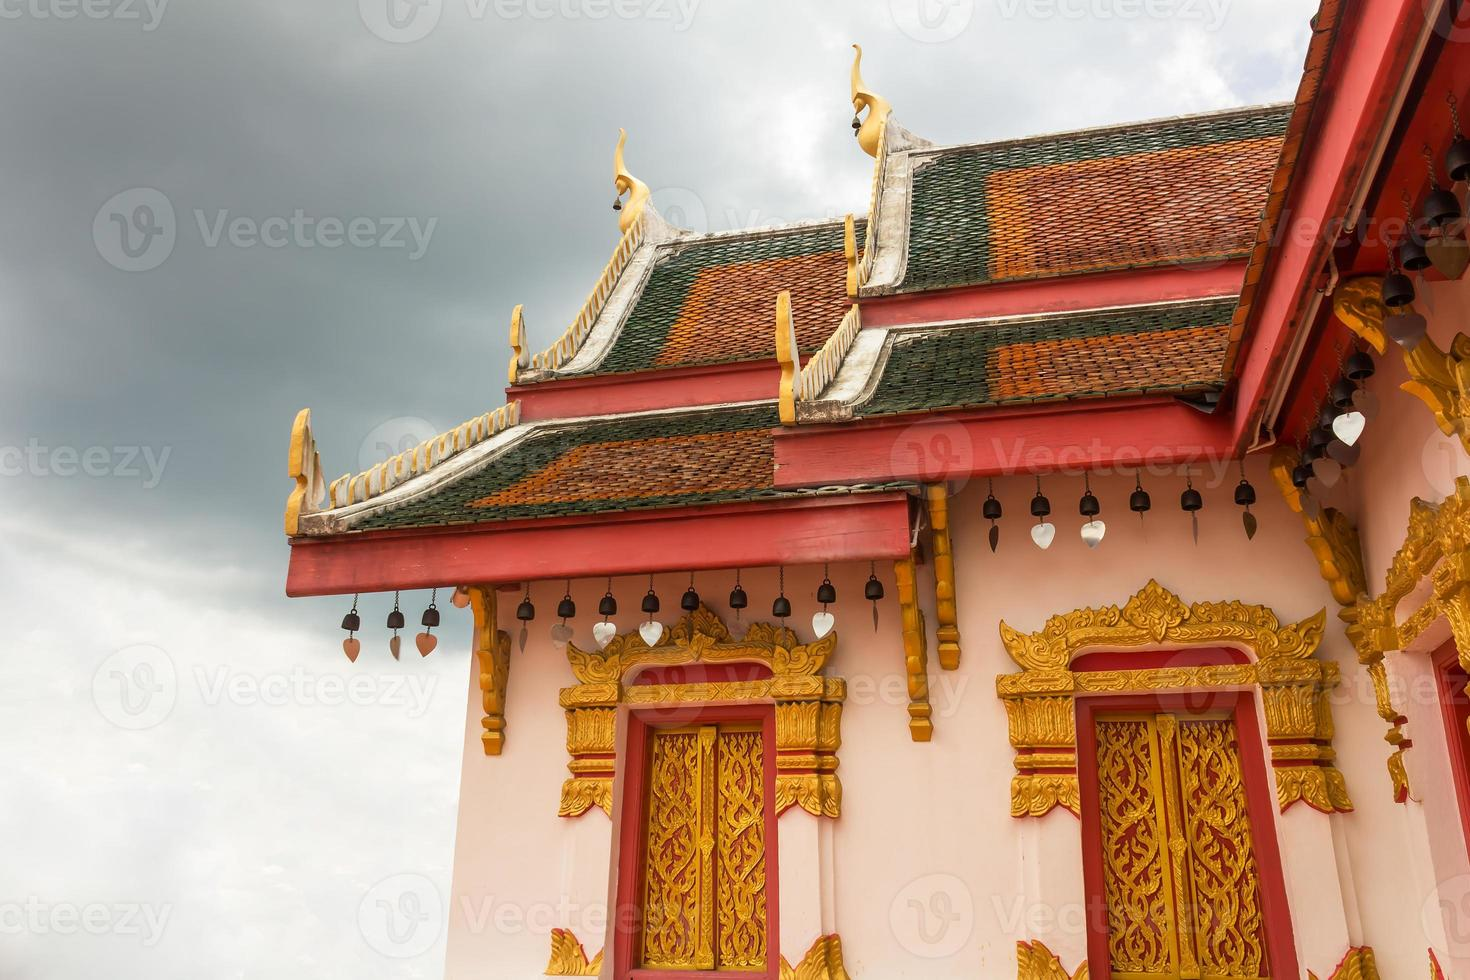 architectuur in het boeddhisme en bewolkte dag foto